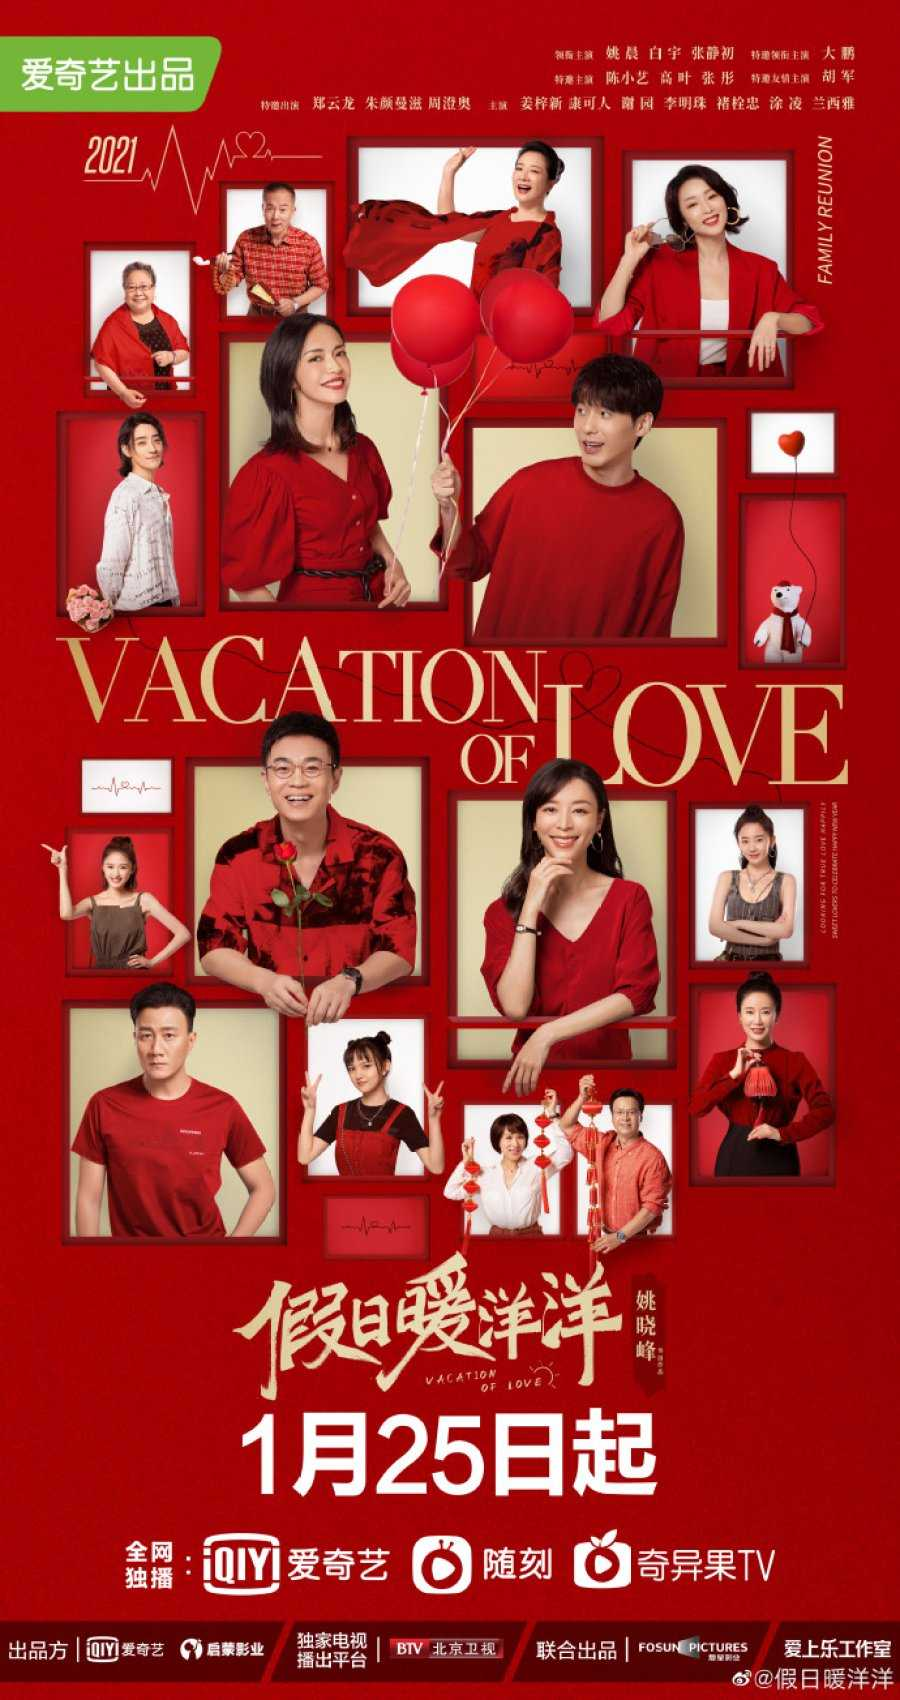 vacation-of-love-พักร้อนนี้มีรัก-2021-ตอนที่-1-35-ซับไทย-จบ-